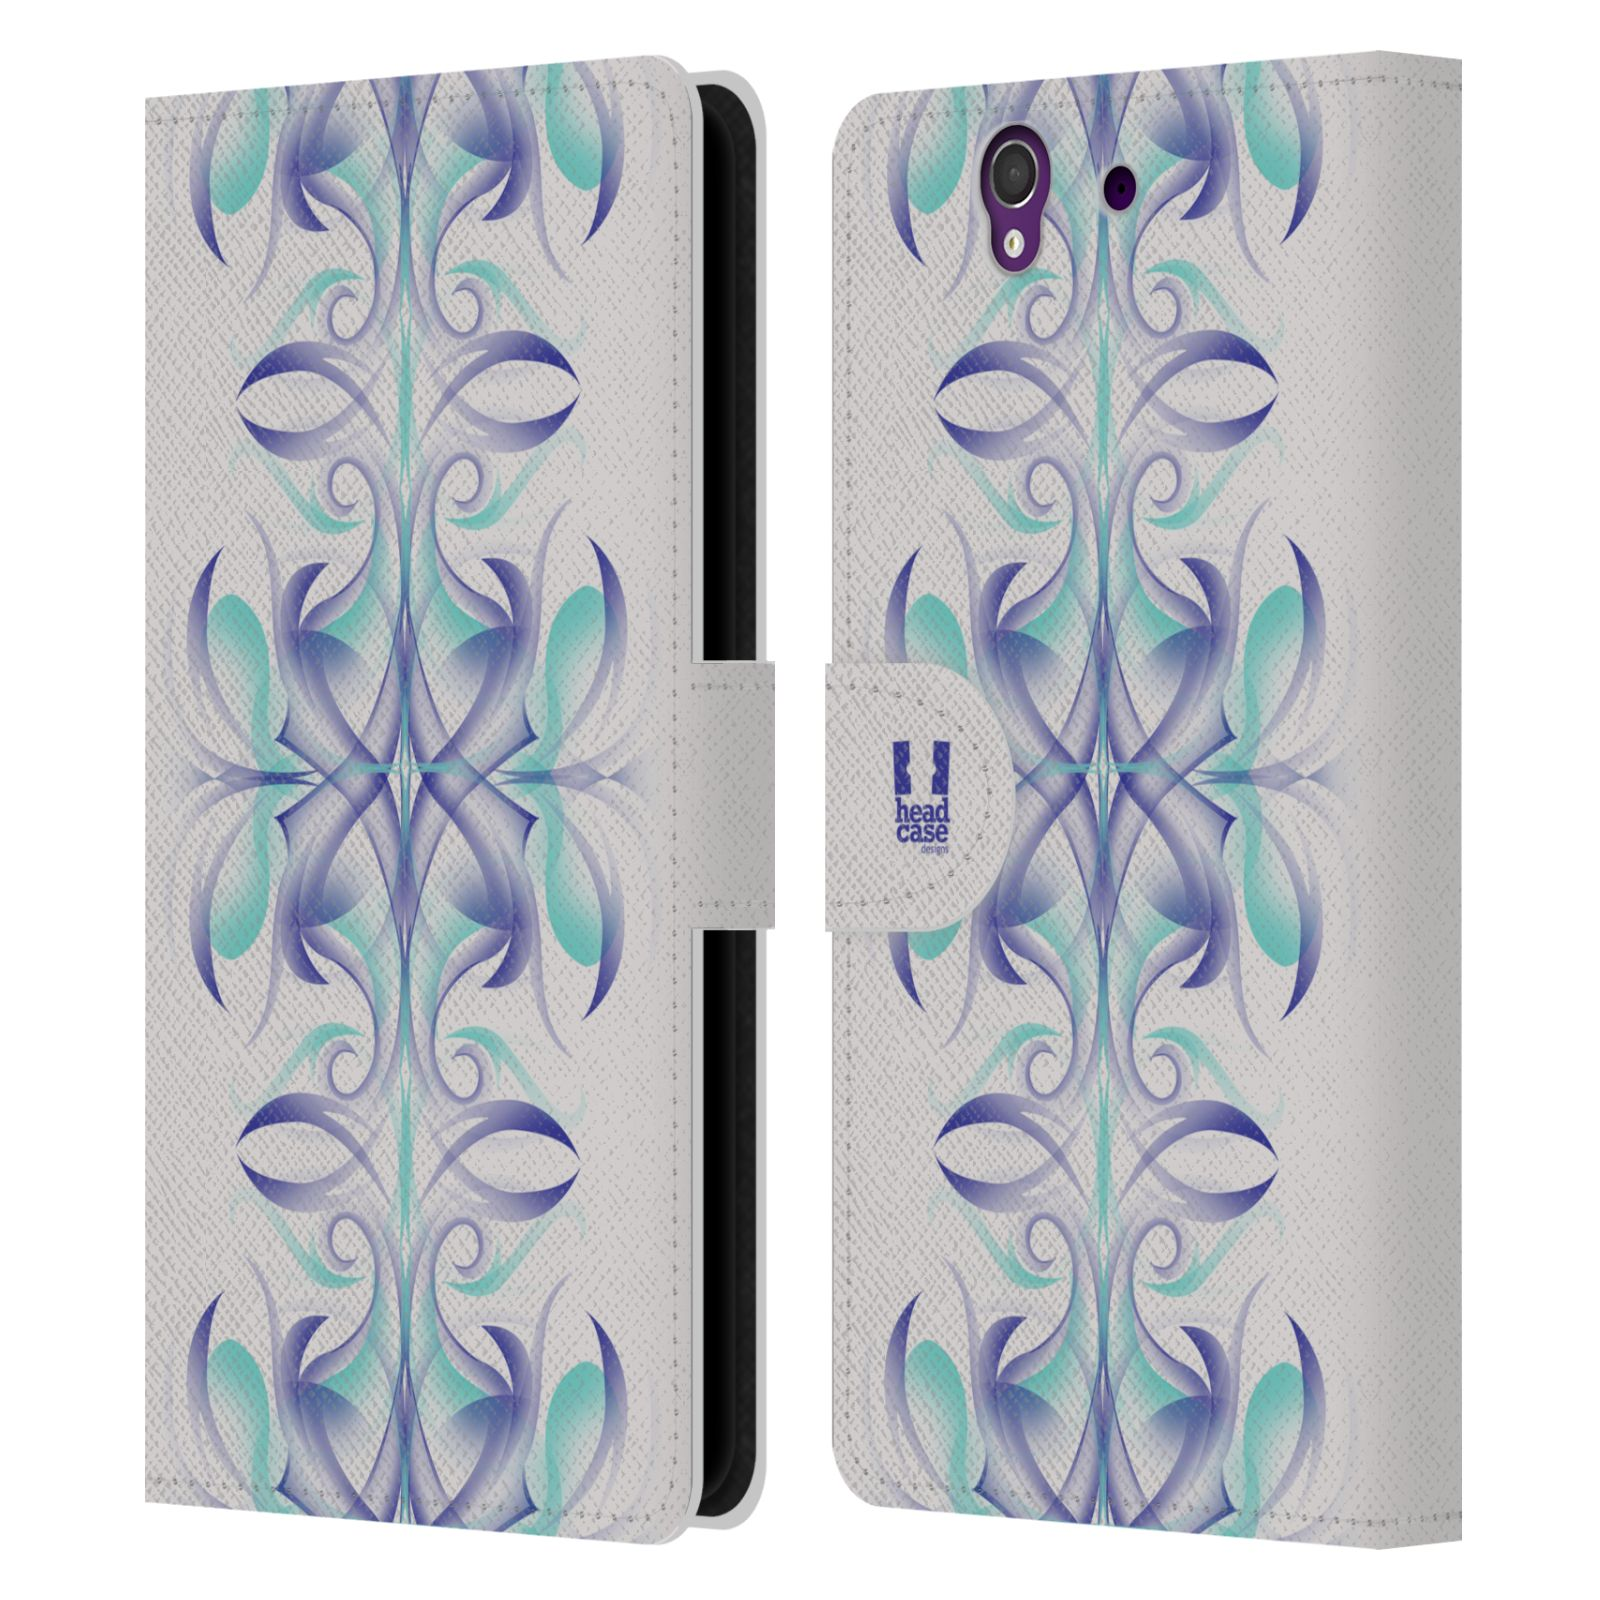 HEAD CASE Flipové pouzdro pro mobil SONY XPERIA Z (C6603) kaleidoskop vlny modrá